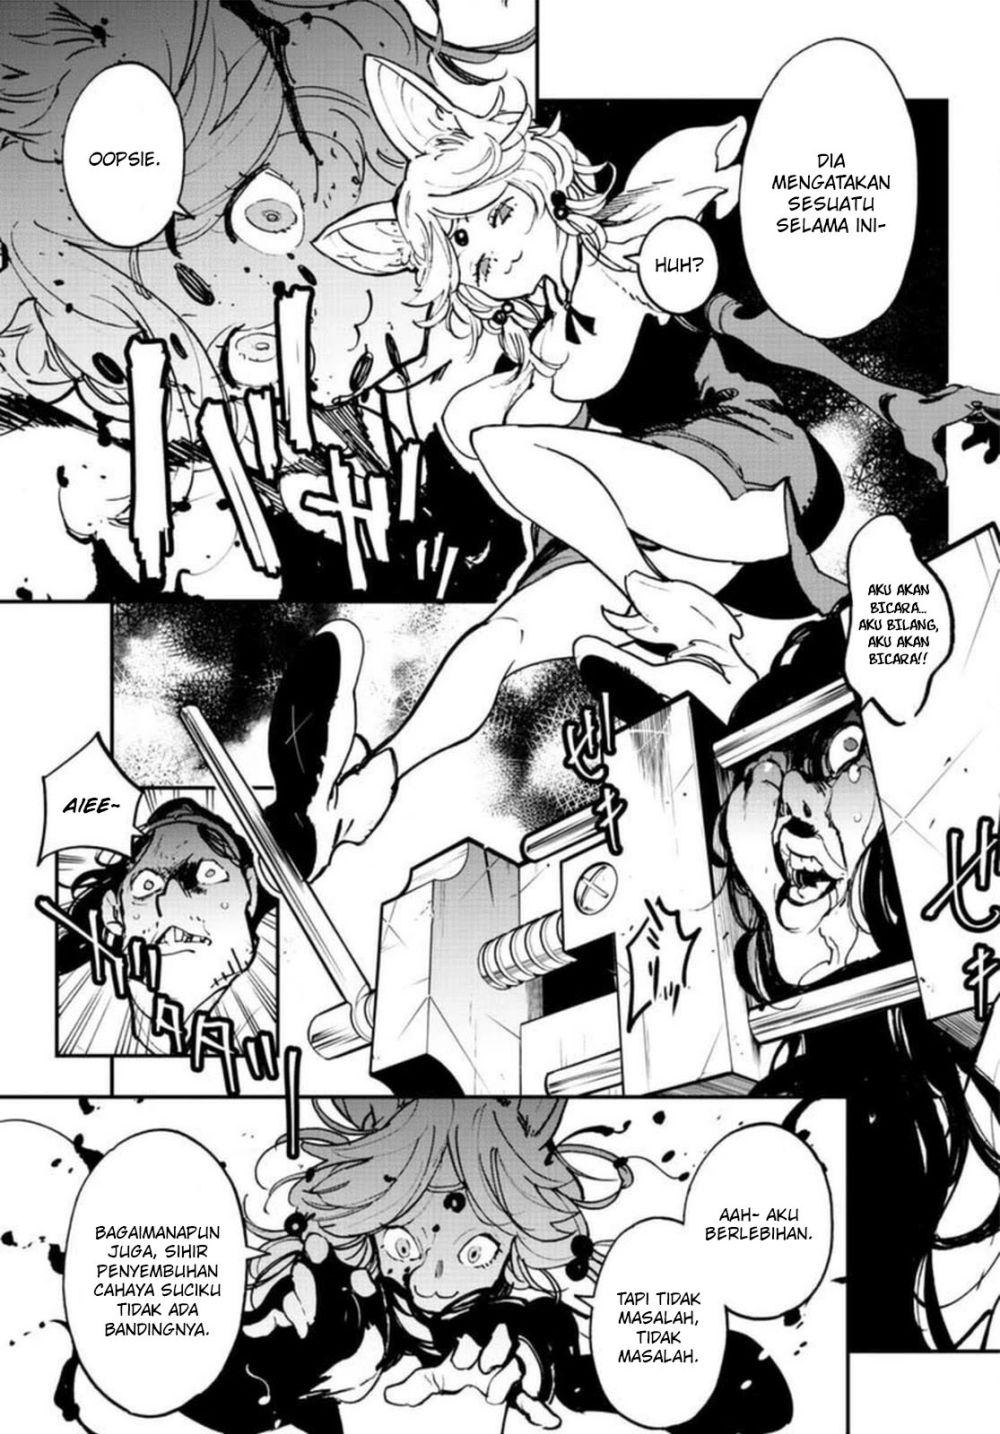 Ninkyou Tensei: Isekai no Yakuzahime: Chapter 24.2 - Page 16